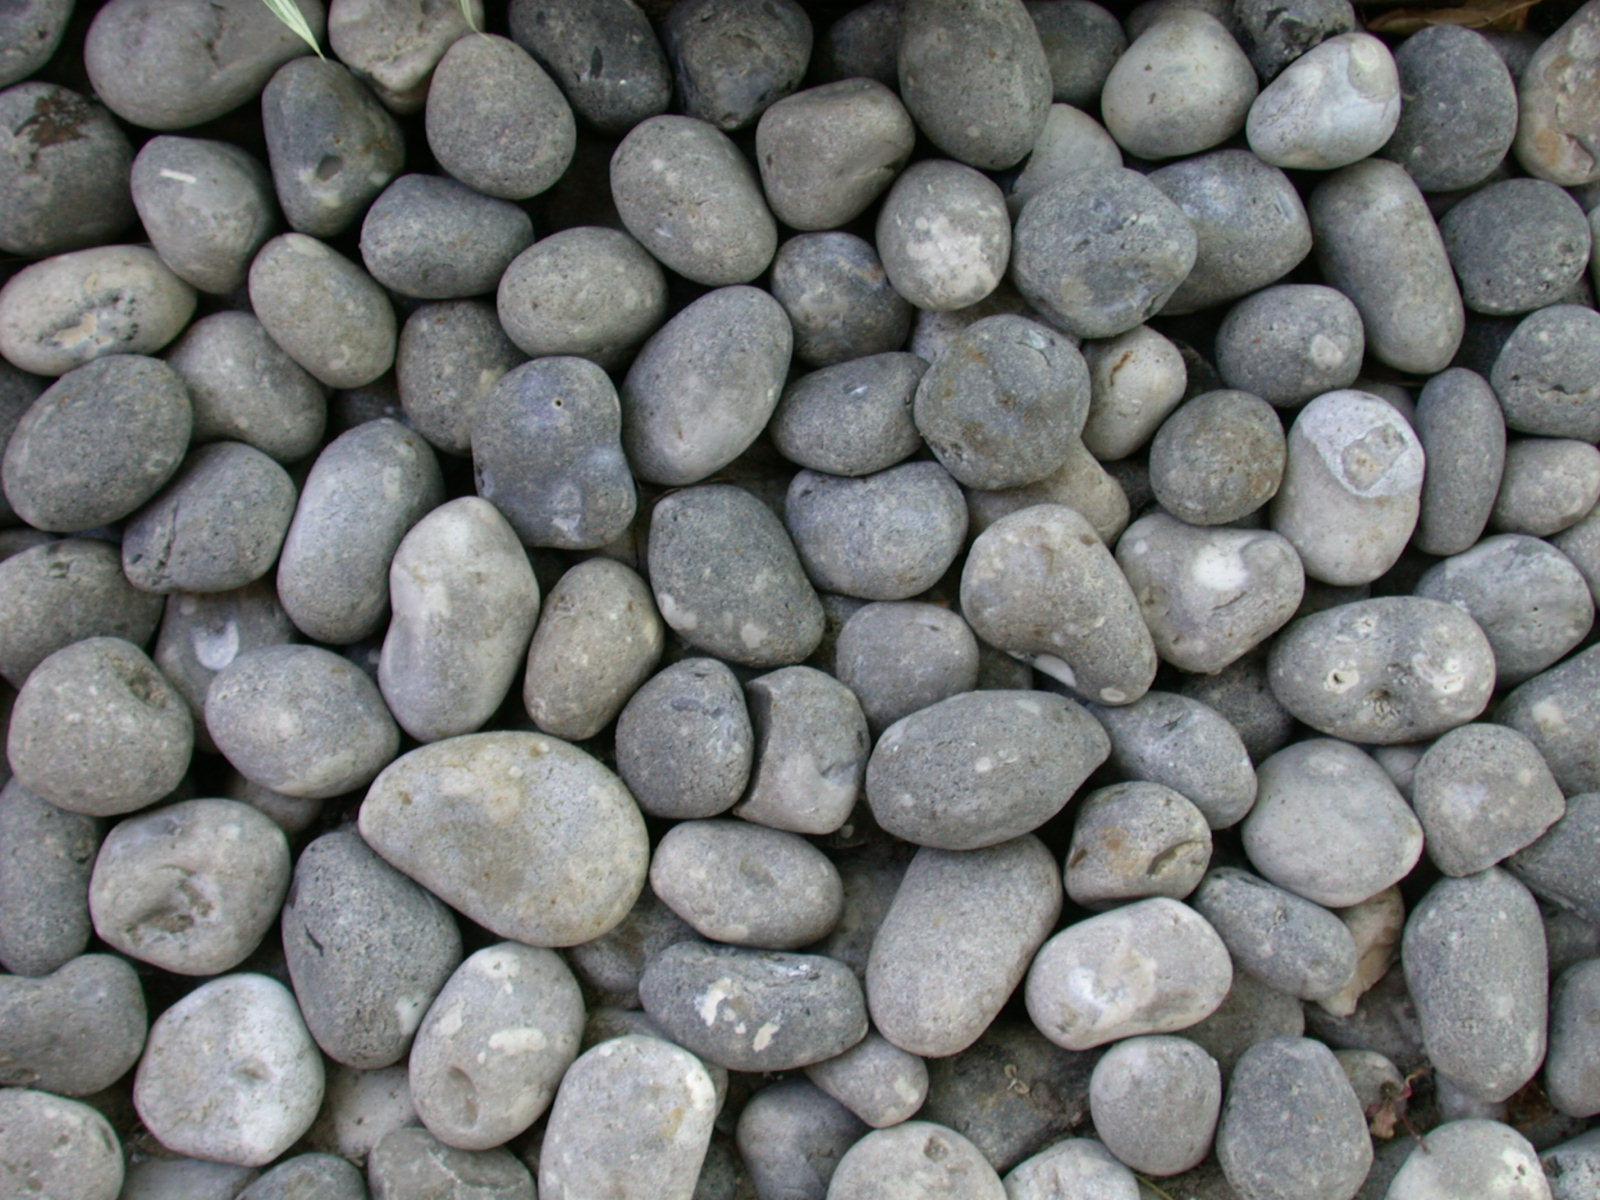 Image*After : texture : rock rocks texture gray pebbles Rocks